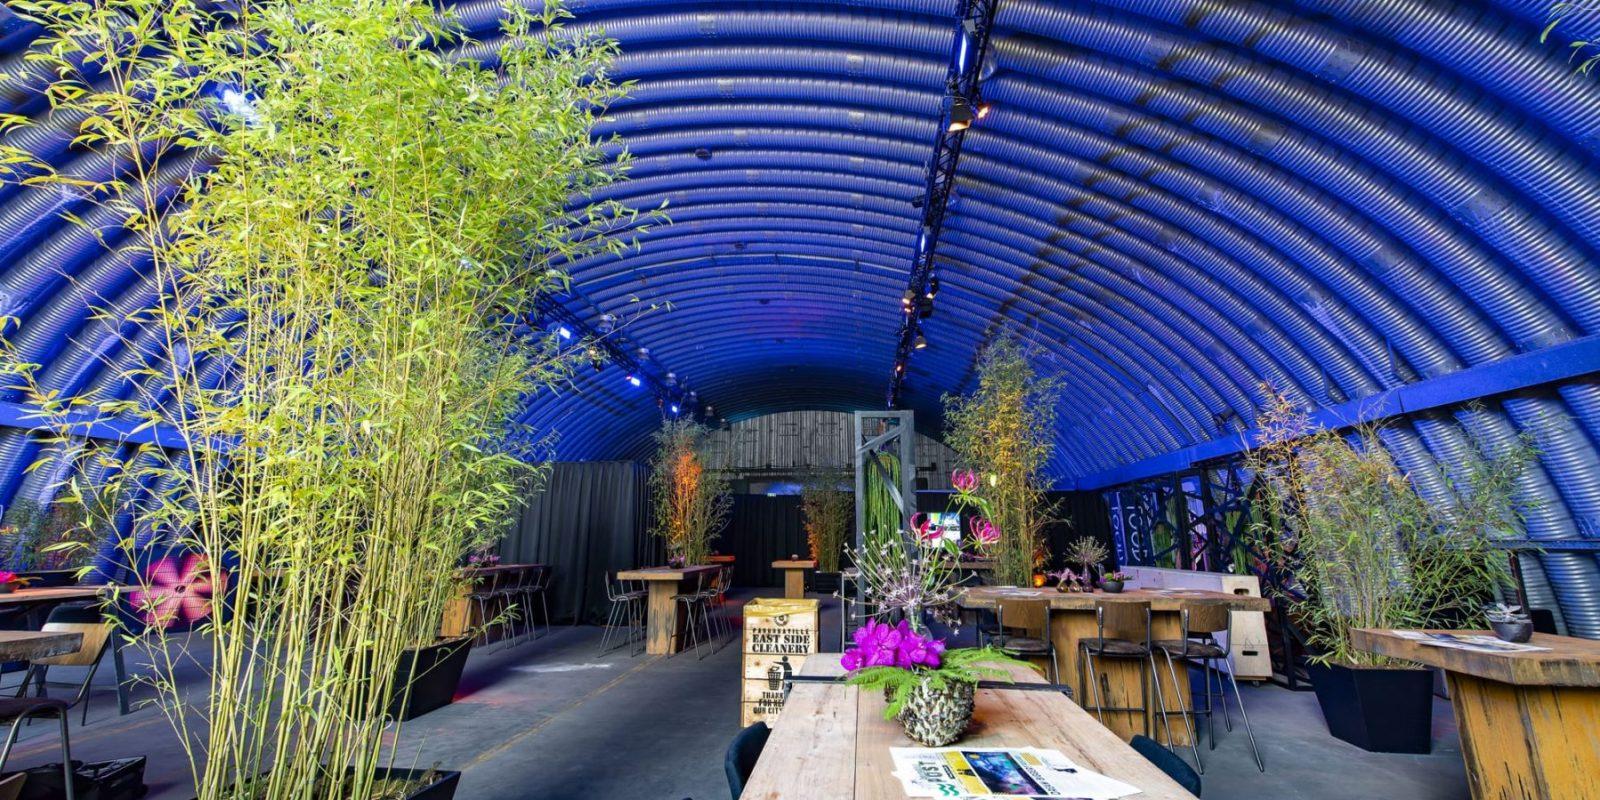 Bas de Boer - Eventstyling Parookaville Festival 2019 : Artistvillage : Backstage : Hangar : Mietmöbel : eventpalnung : eventmanagement : eventdekoration www.basdeboer-eventstyling.de - 092